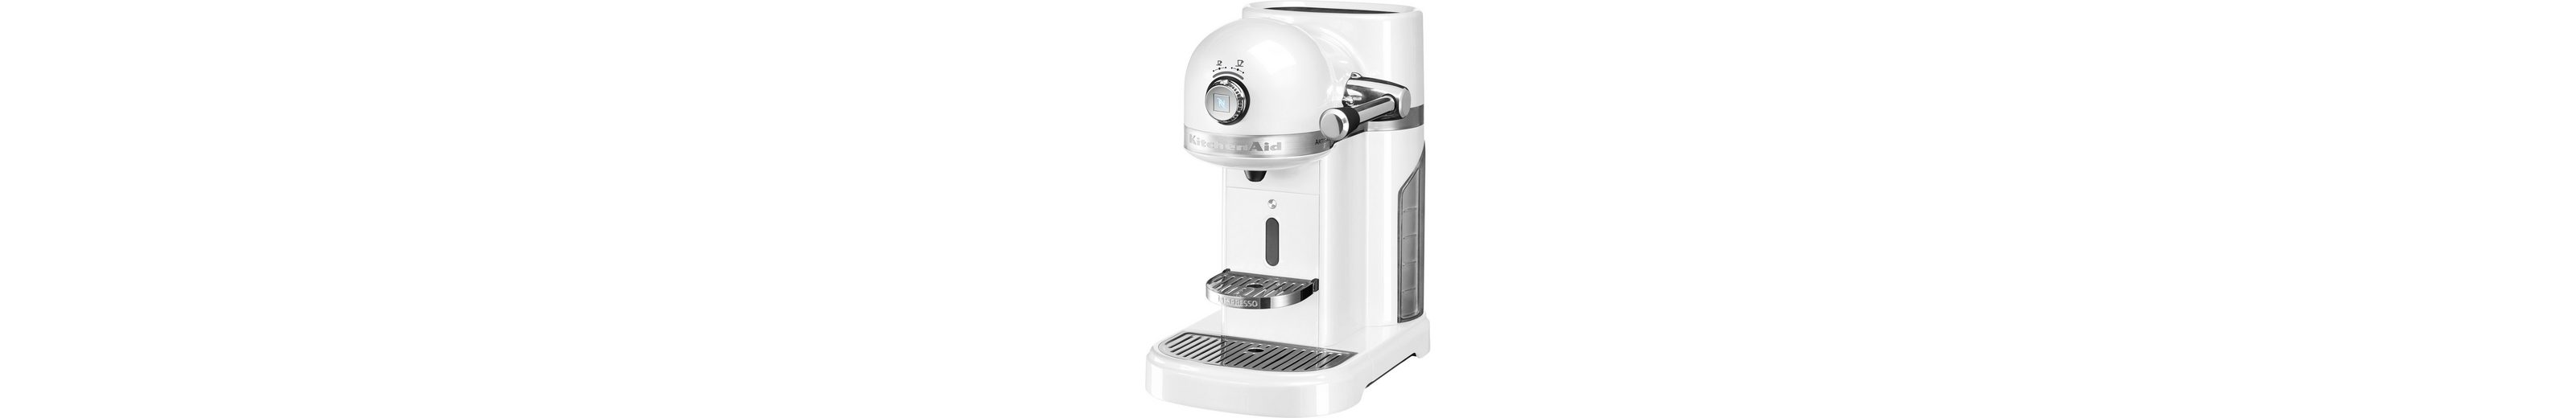 Kitchenaid Nespresso KitchenAid 5KES0503EFP, frosted pearl